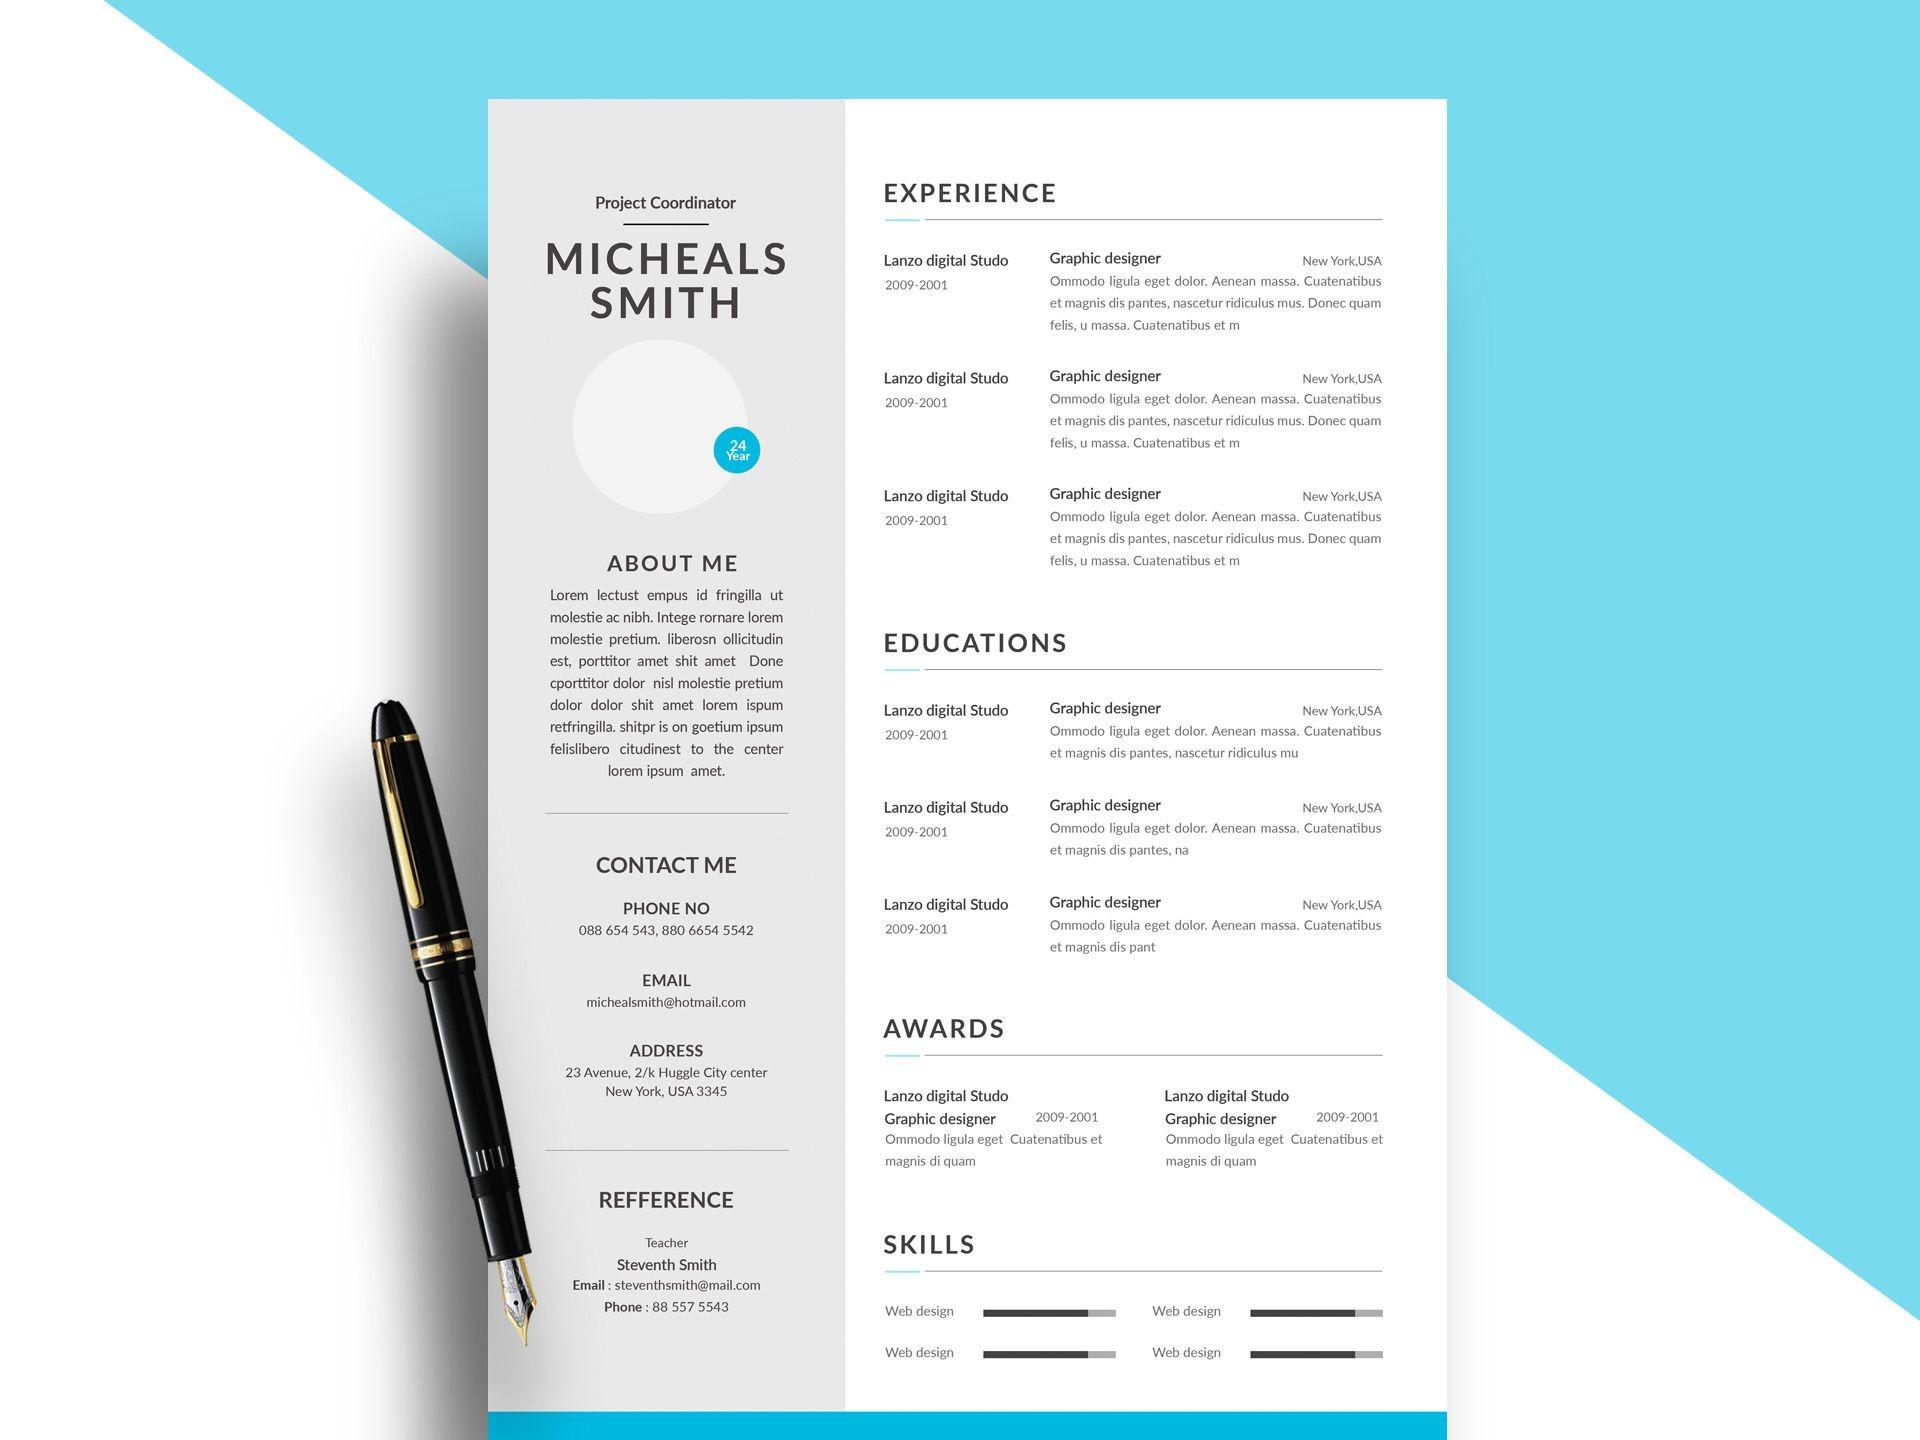 004 Top Psd Resume Template Free Download High Def  Graphic Designer Creative Cv1920